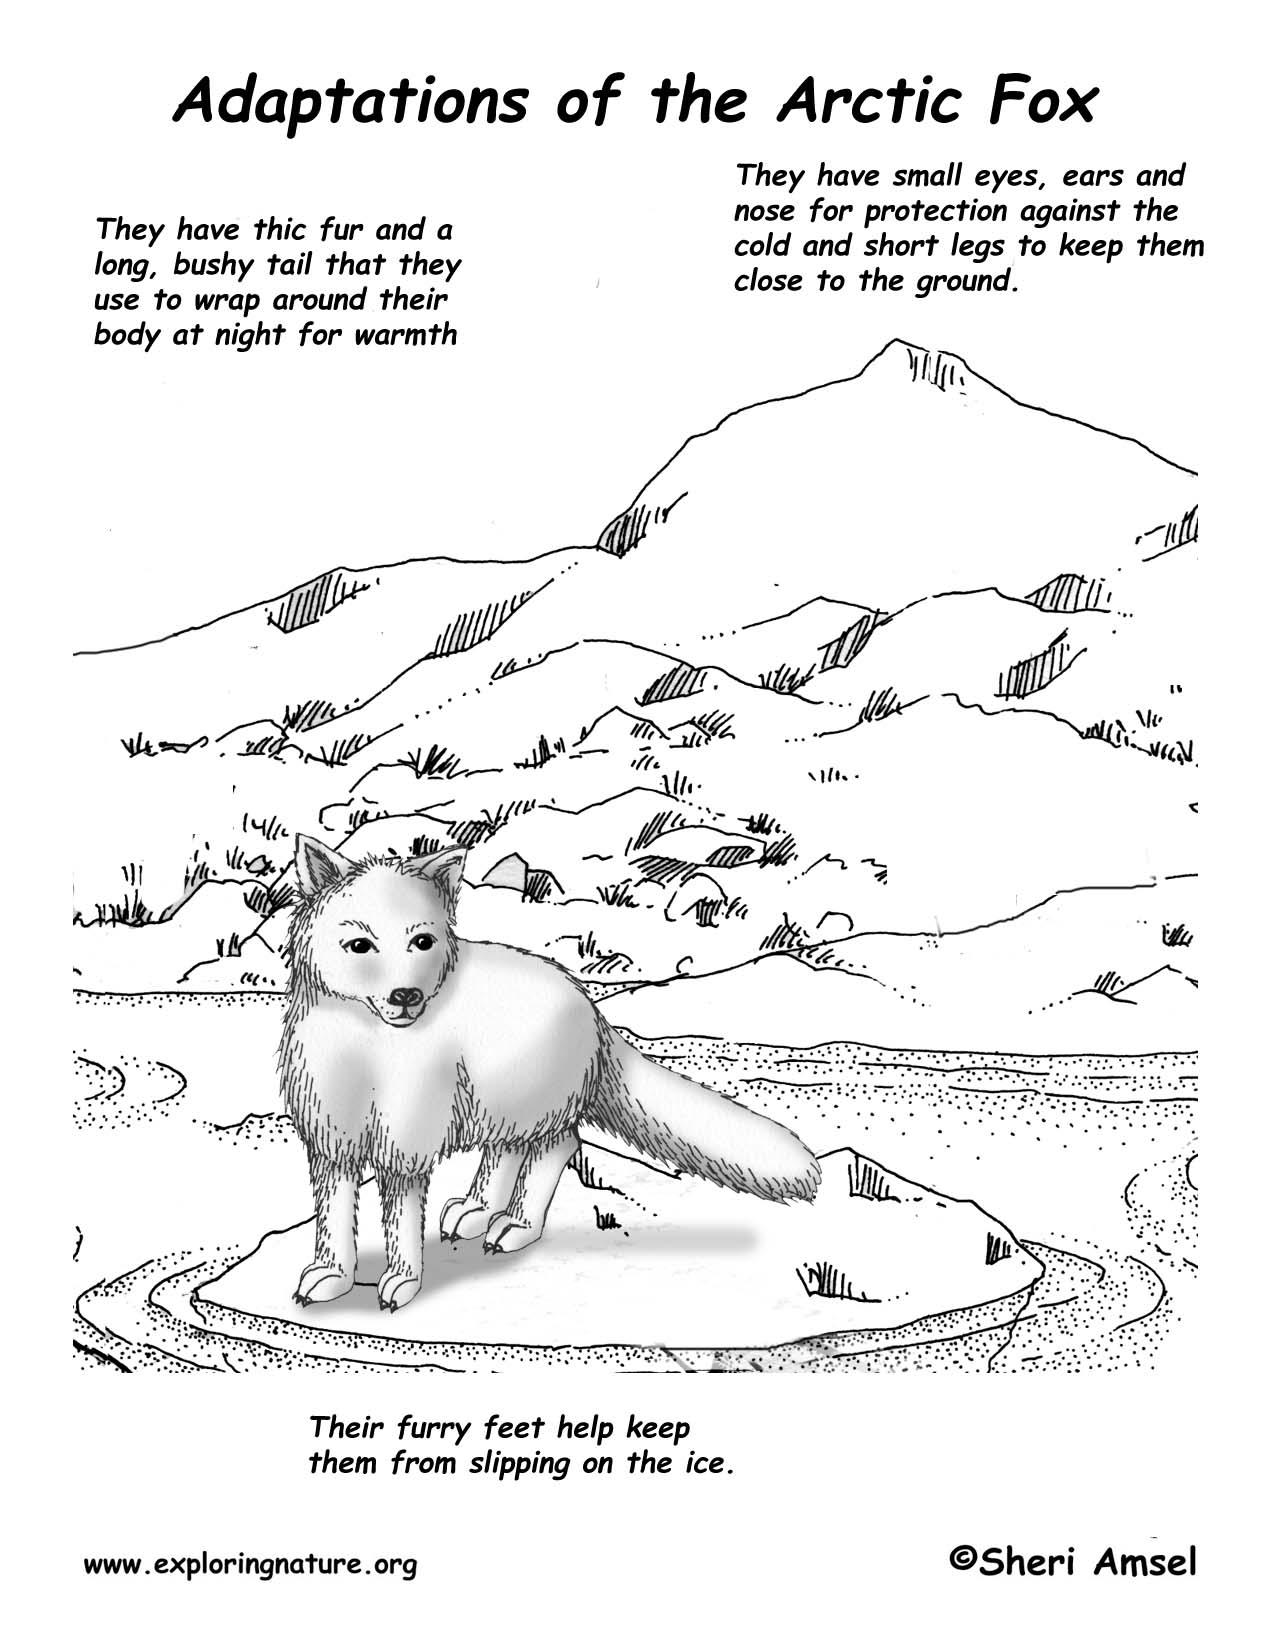 arctic fox adaptations in the tundra